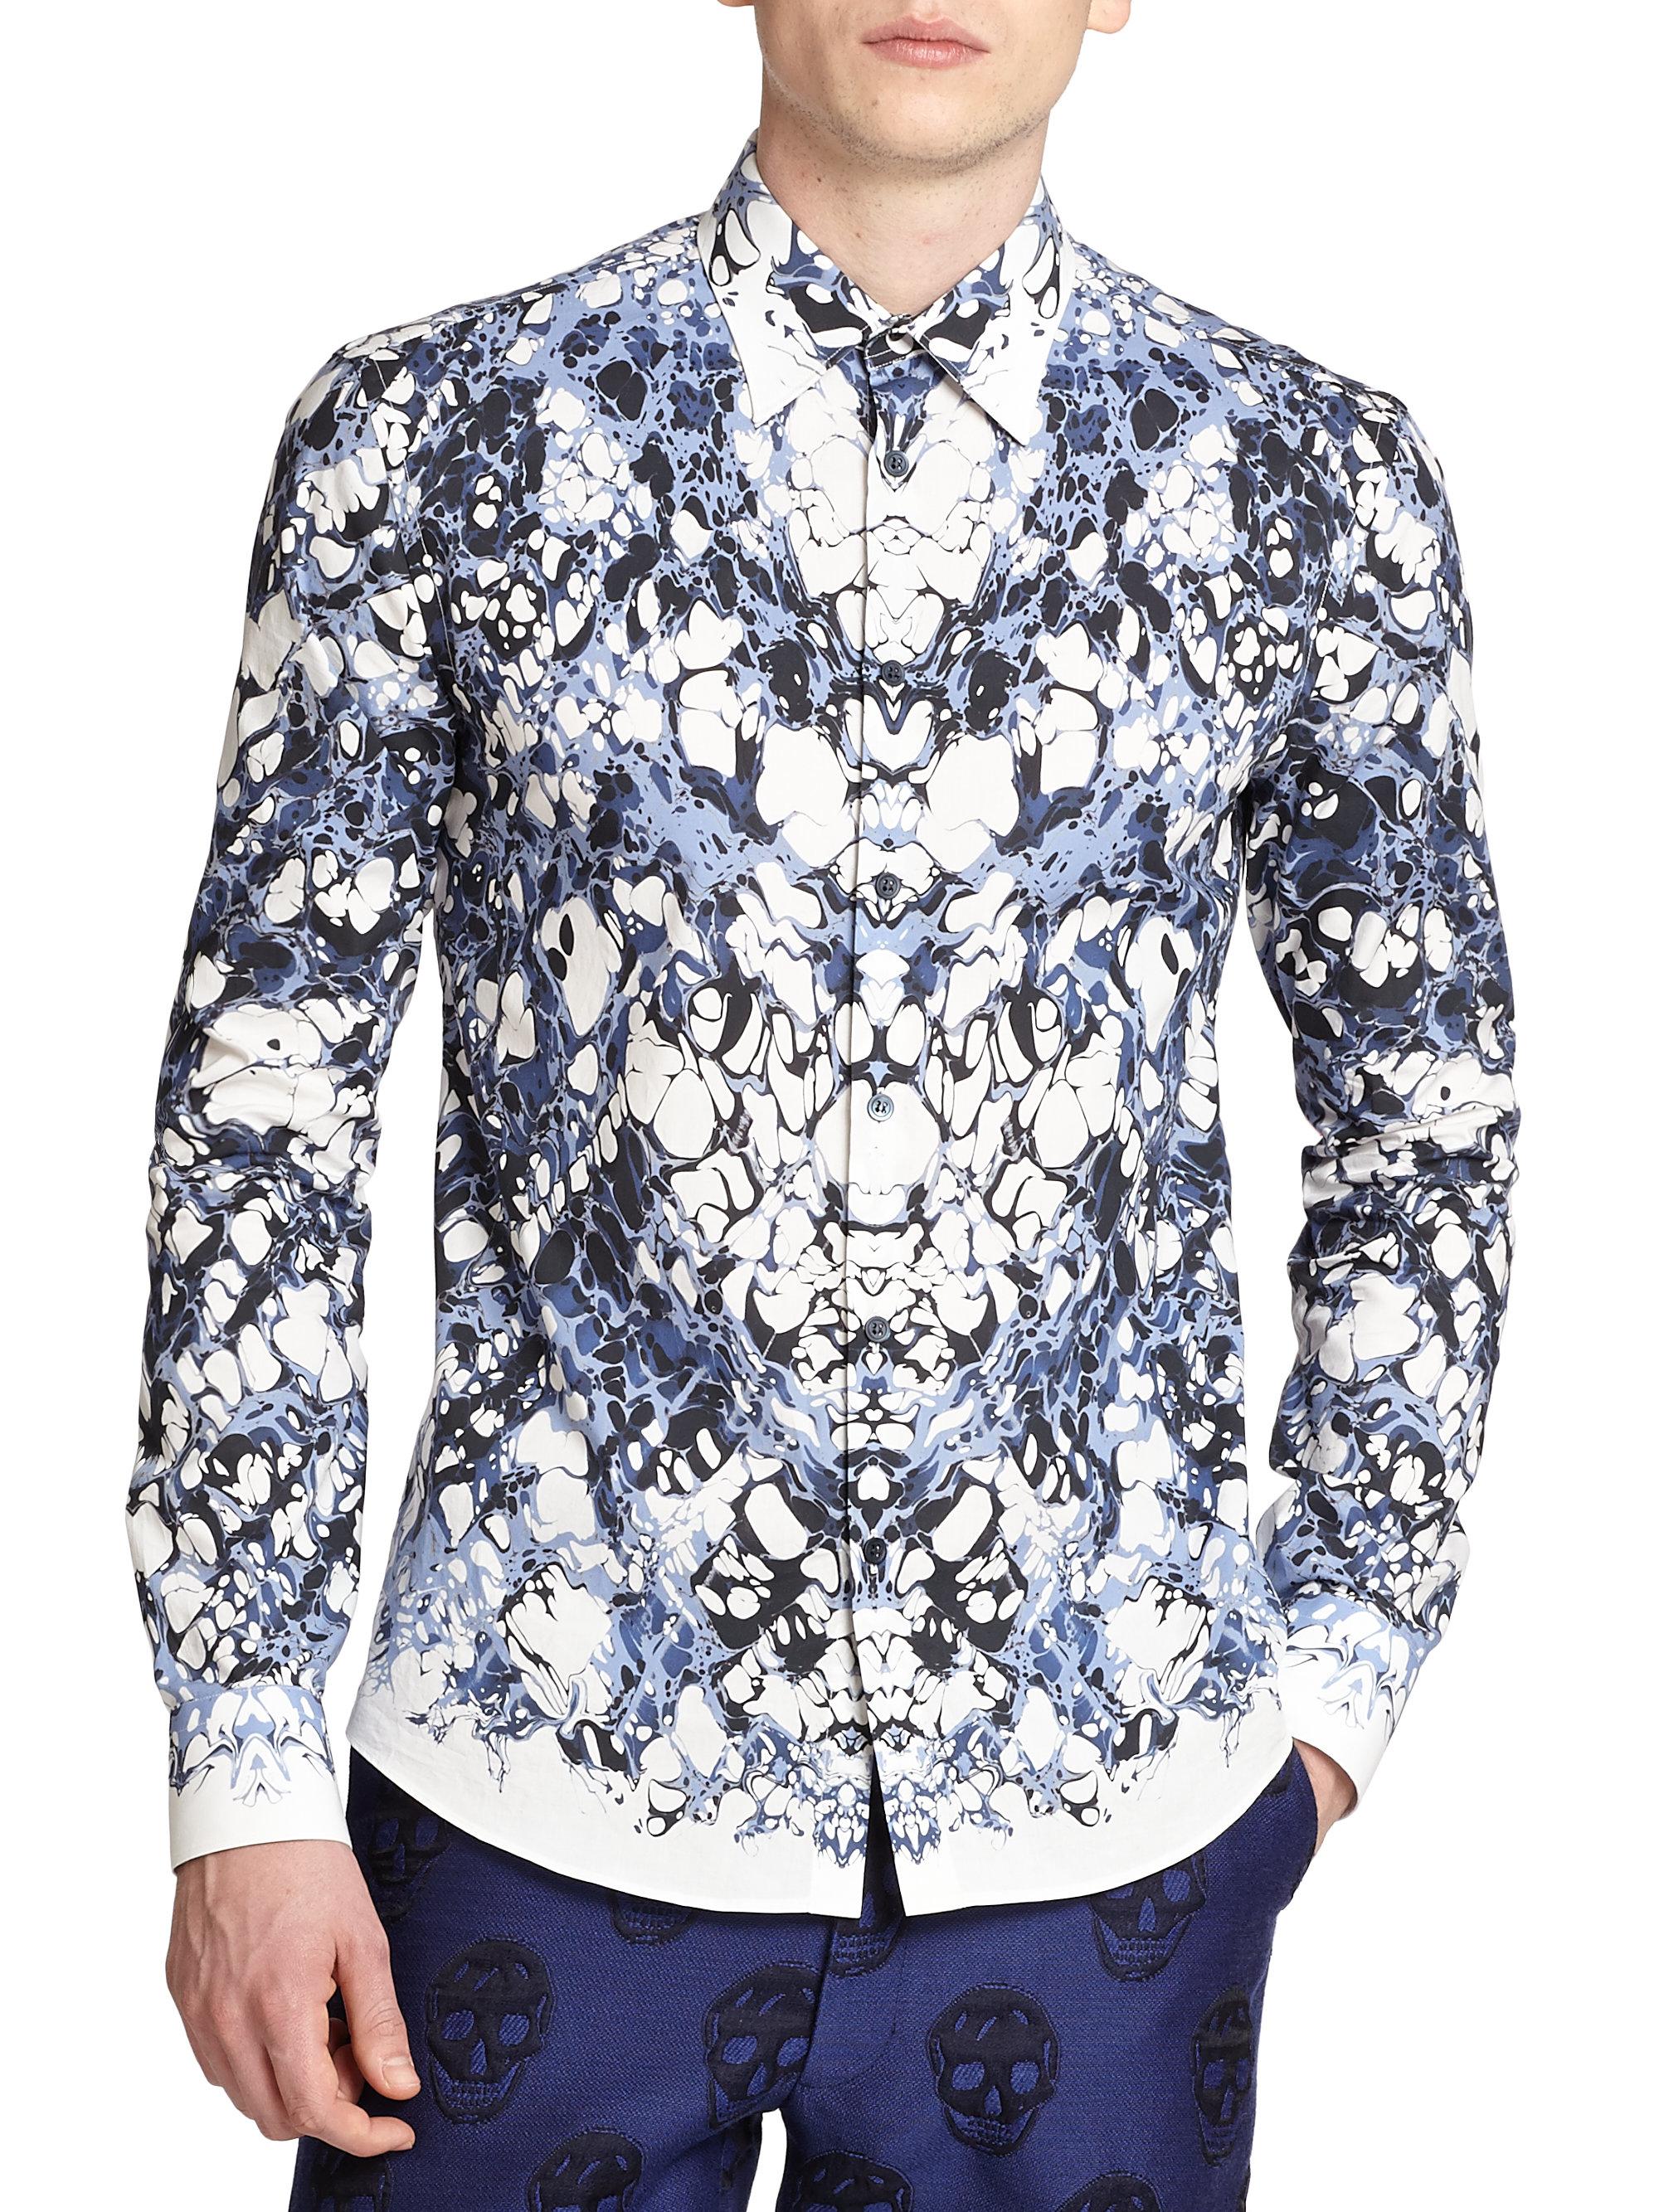 Lyst Alexander Mcqueen Marble Shirt In Blue For Men